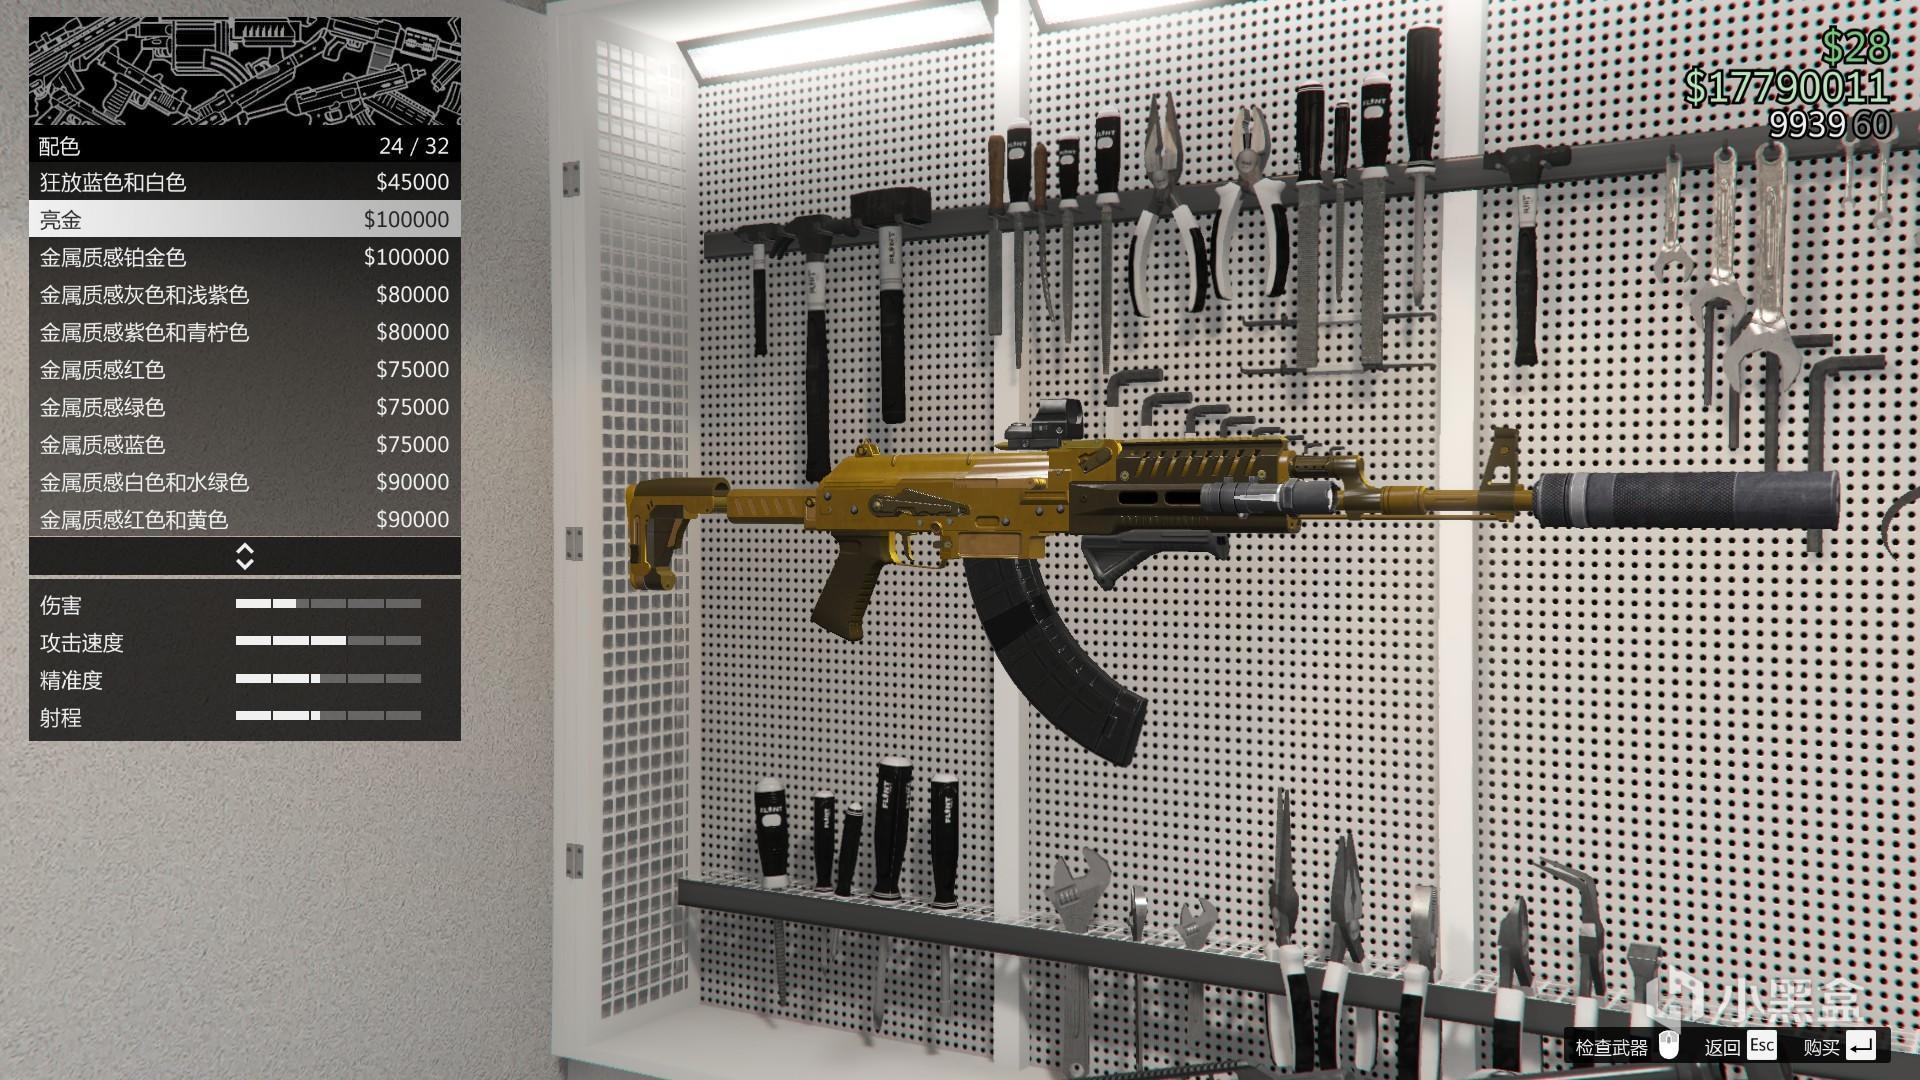 GTA5 线上模式各阶段武器推荐(中期)插图14